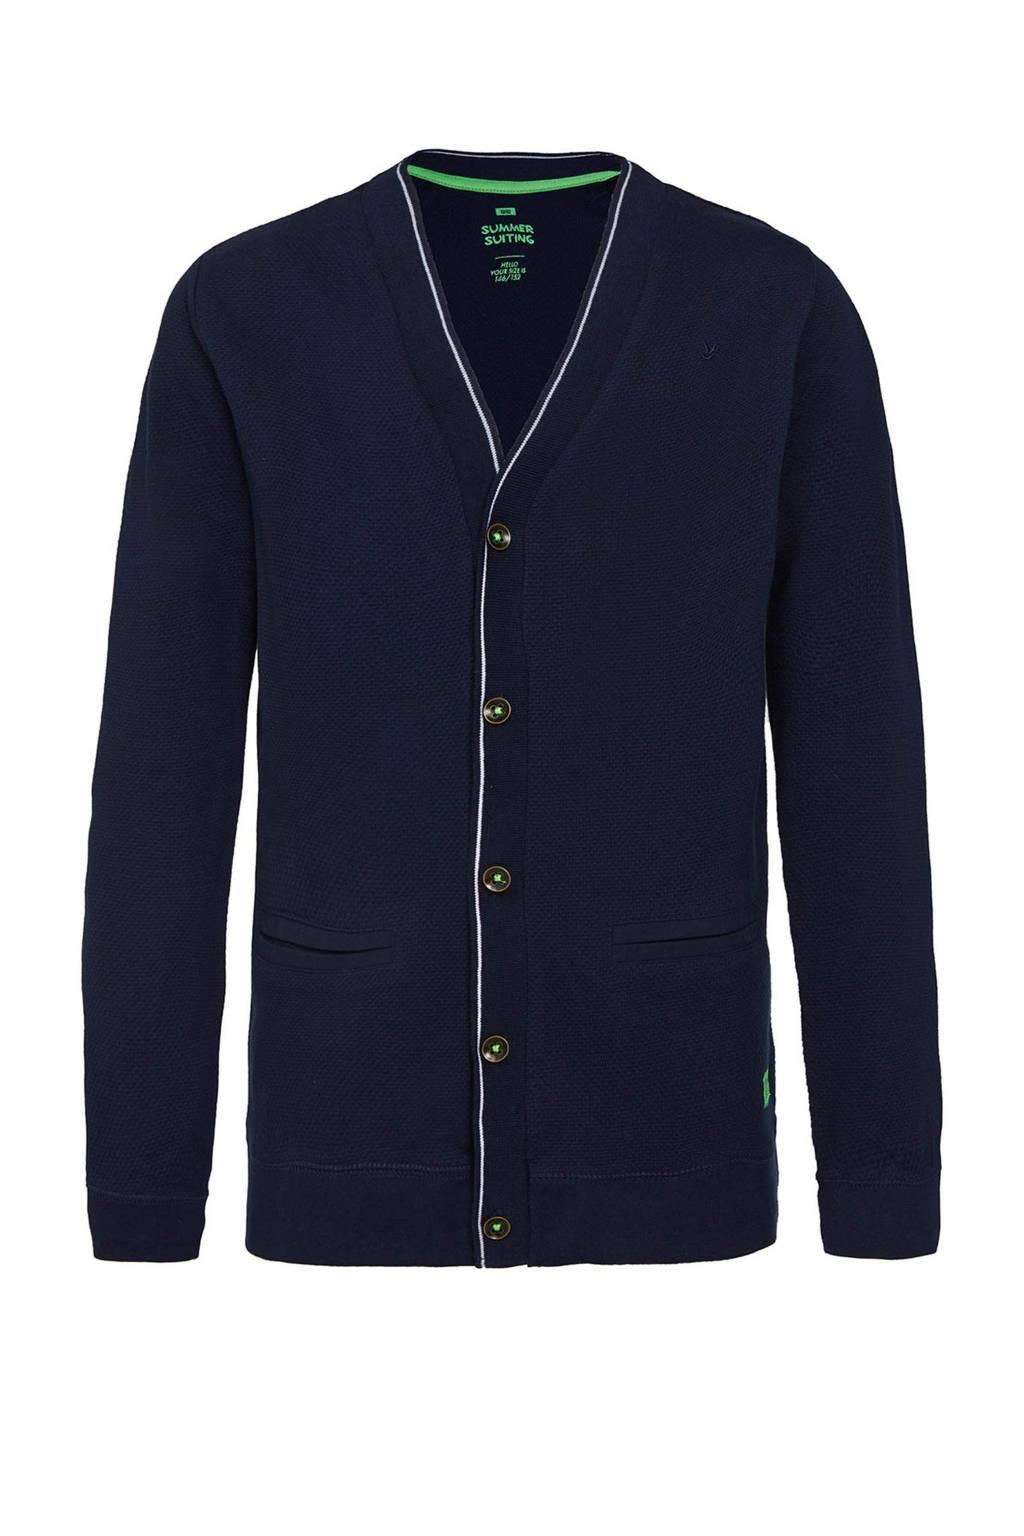 WE Fashion gebreid vest met textuur donkerblauw/wit/groen, Donkerblauw/wit/groen